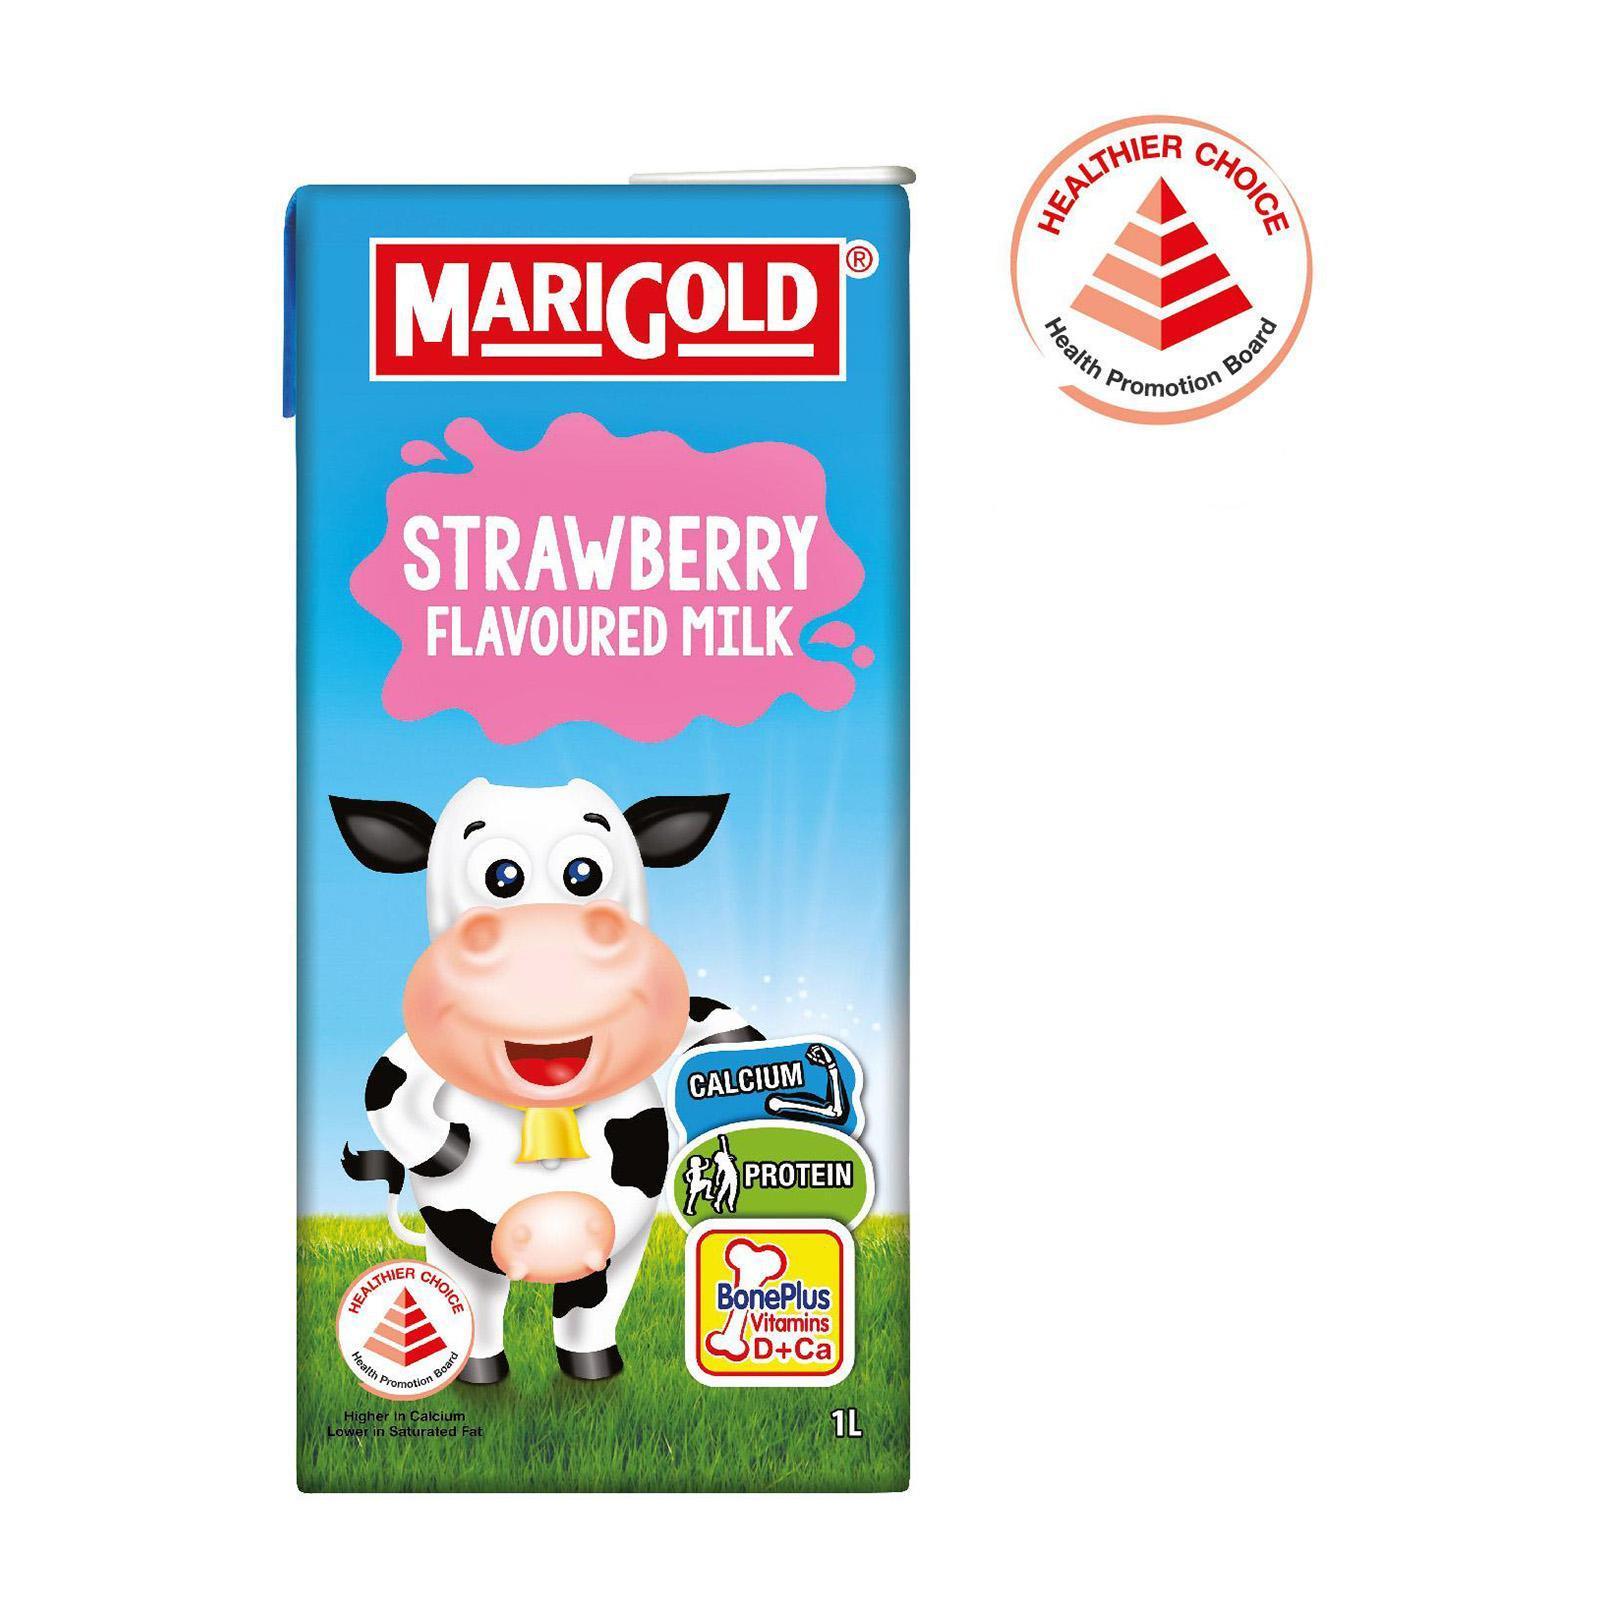 Marigold Uht Strawberry Milk By Redmart.